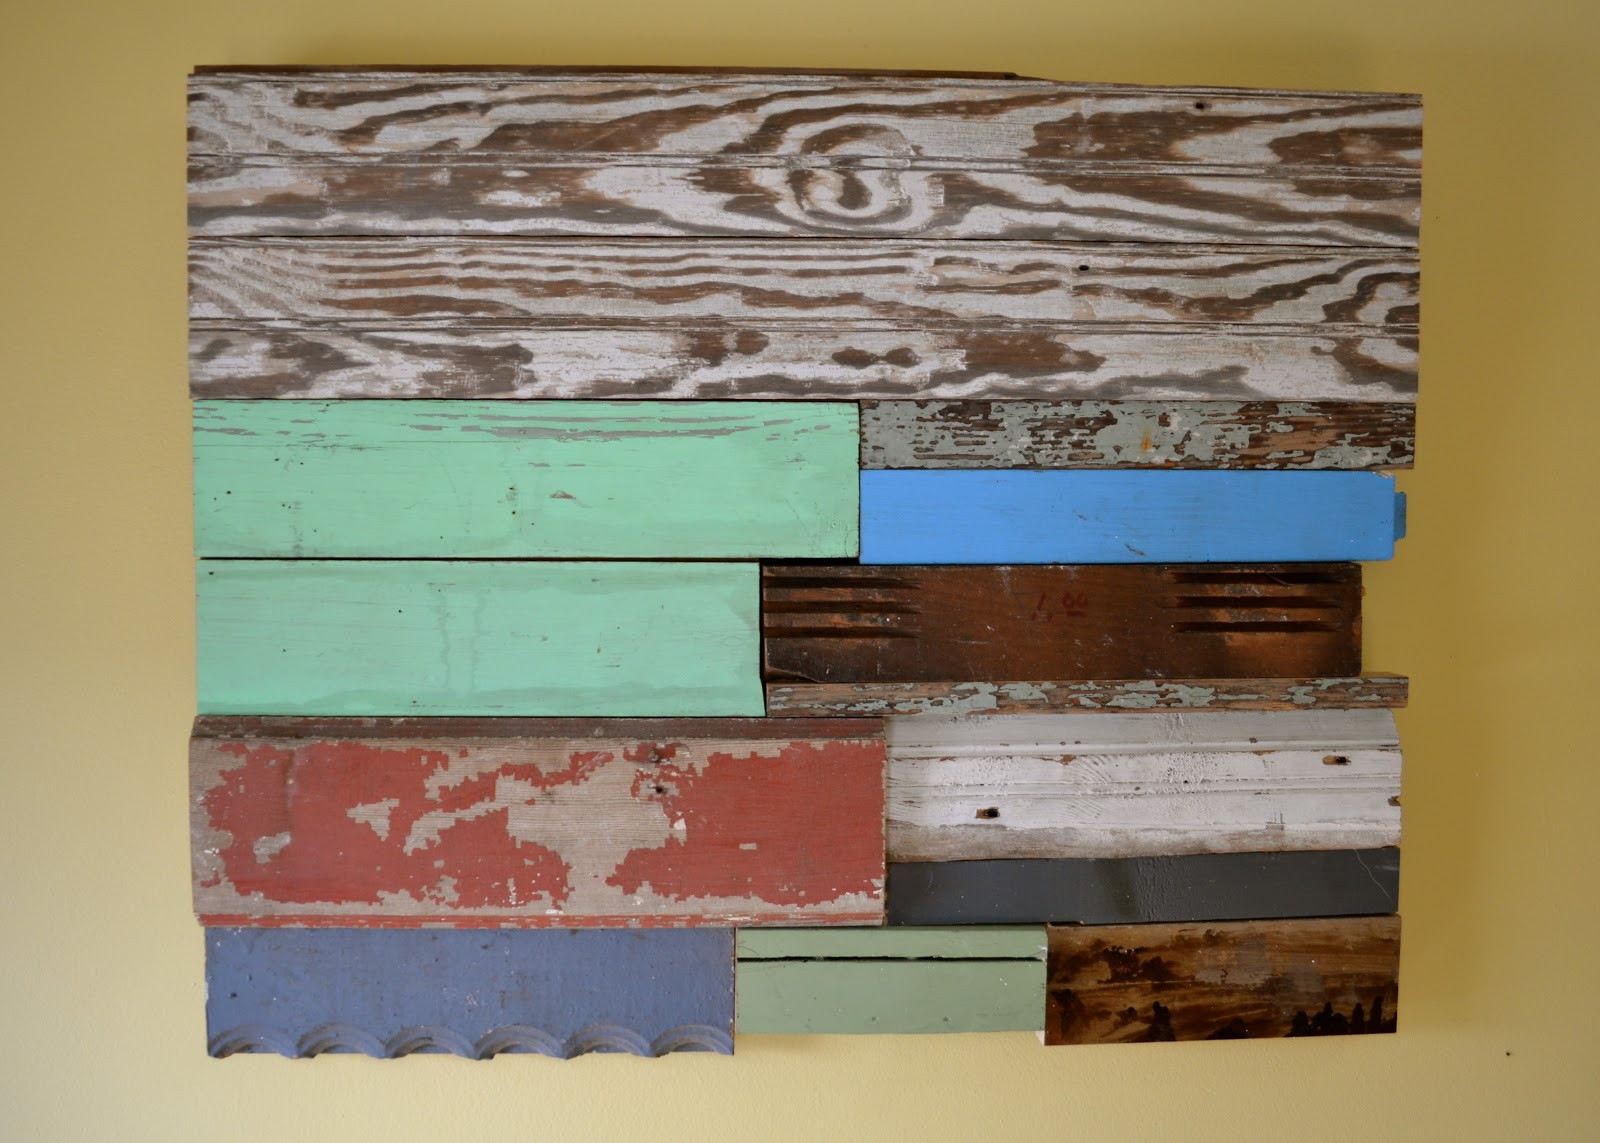 Reclaimed Wood Wall Art DIY  The Domestic Doozie DIY Reclaimed Wood Wall Art